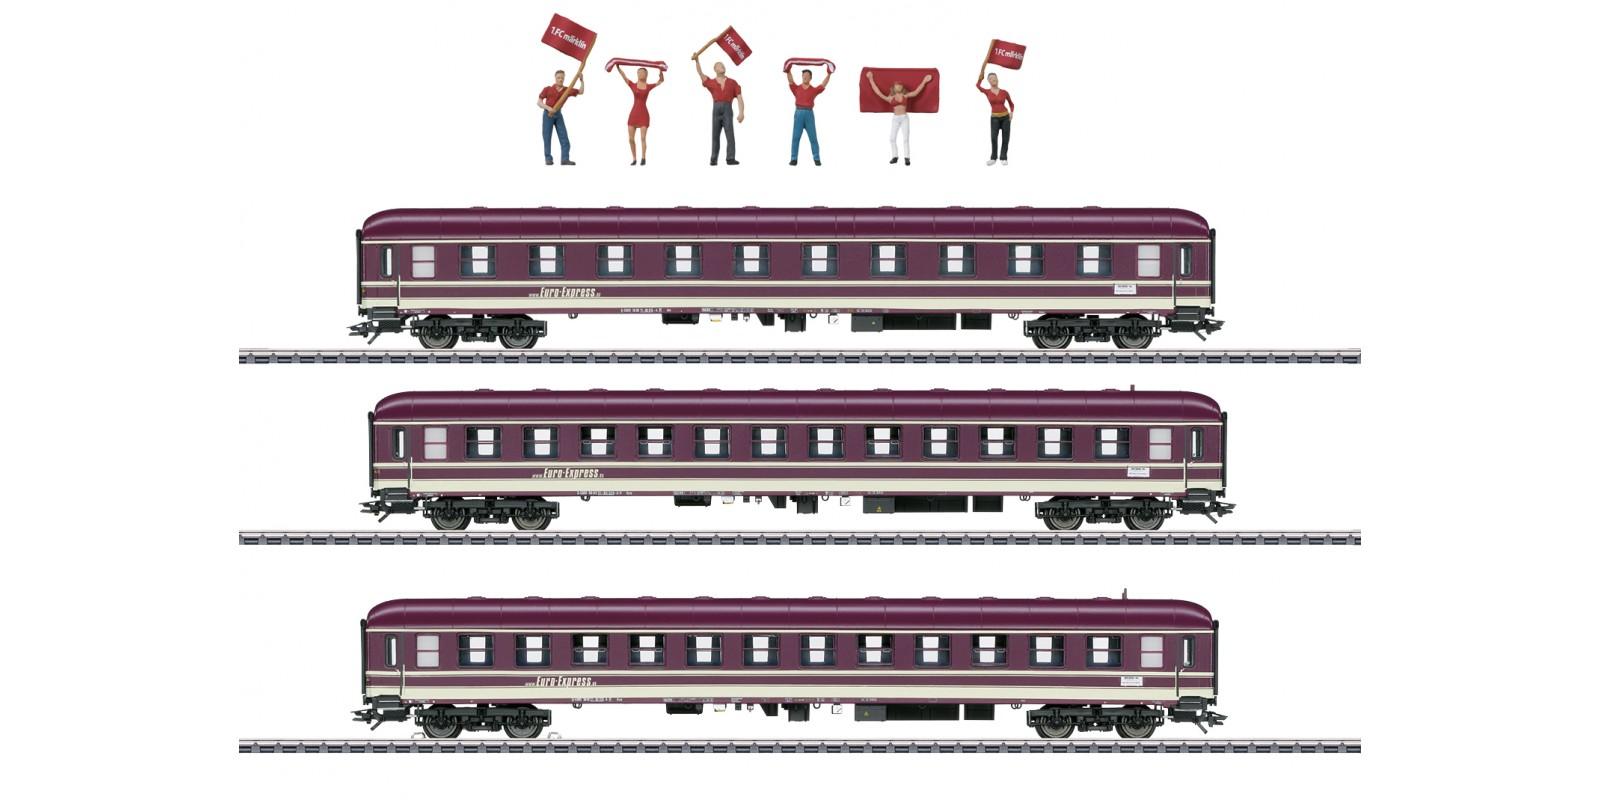 43947 Three Compartment Cars